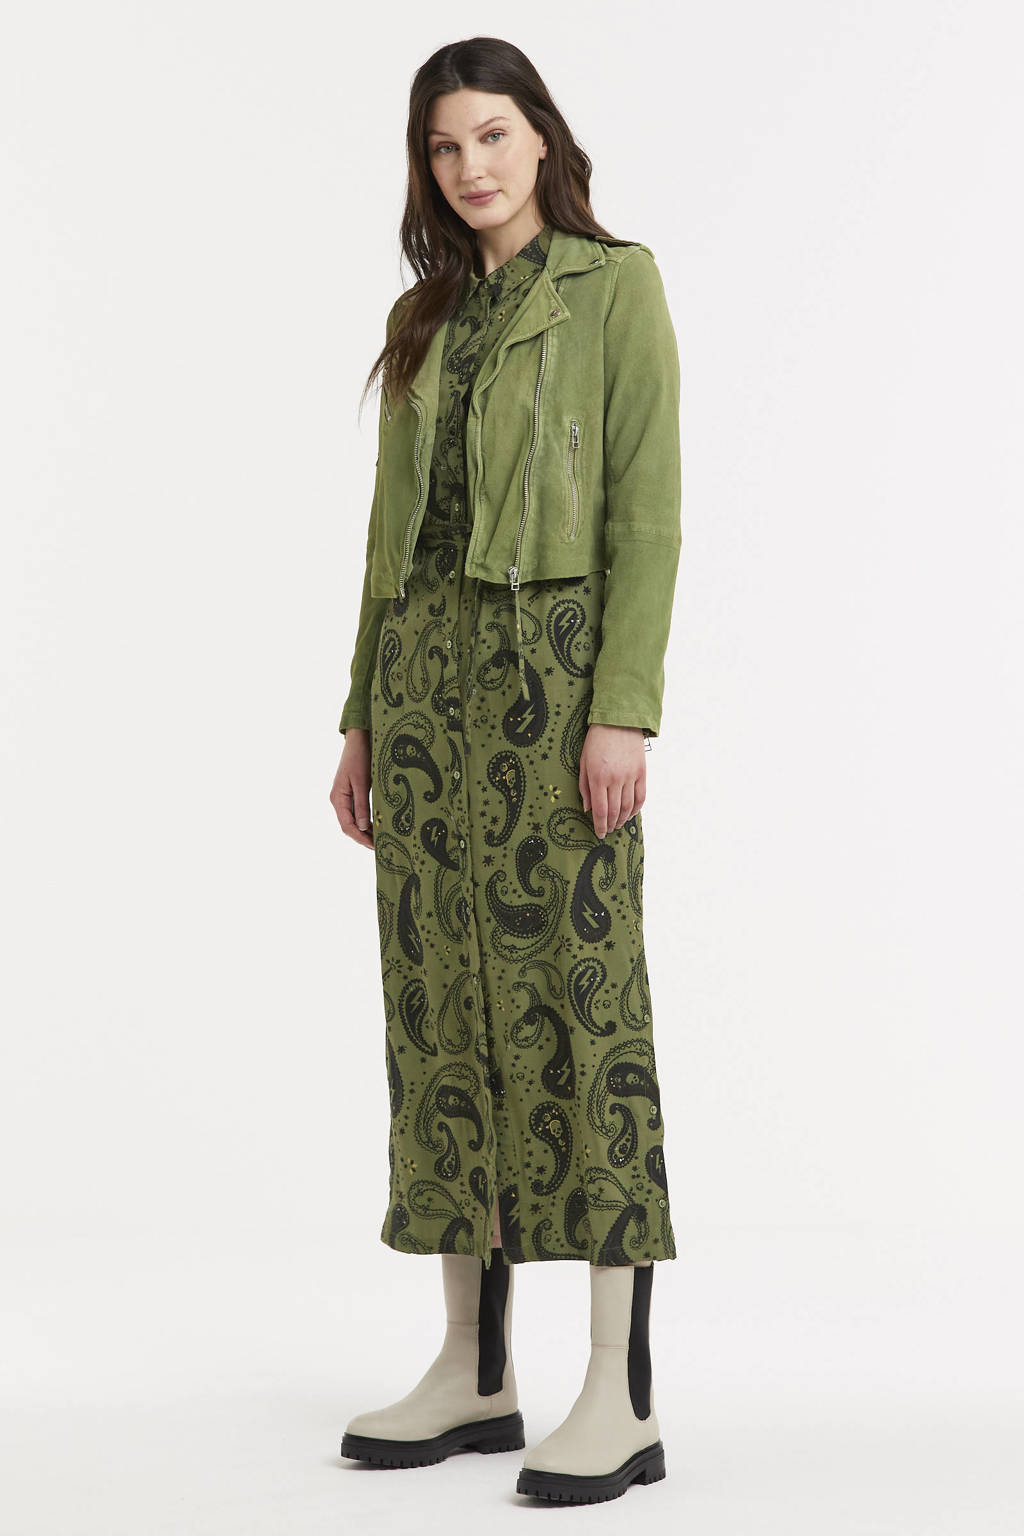 Goosecraft maxi blousejurk Harlow met paisleyprint olijfgroen/zwart/geel, Olijfgroen/zwart/geel